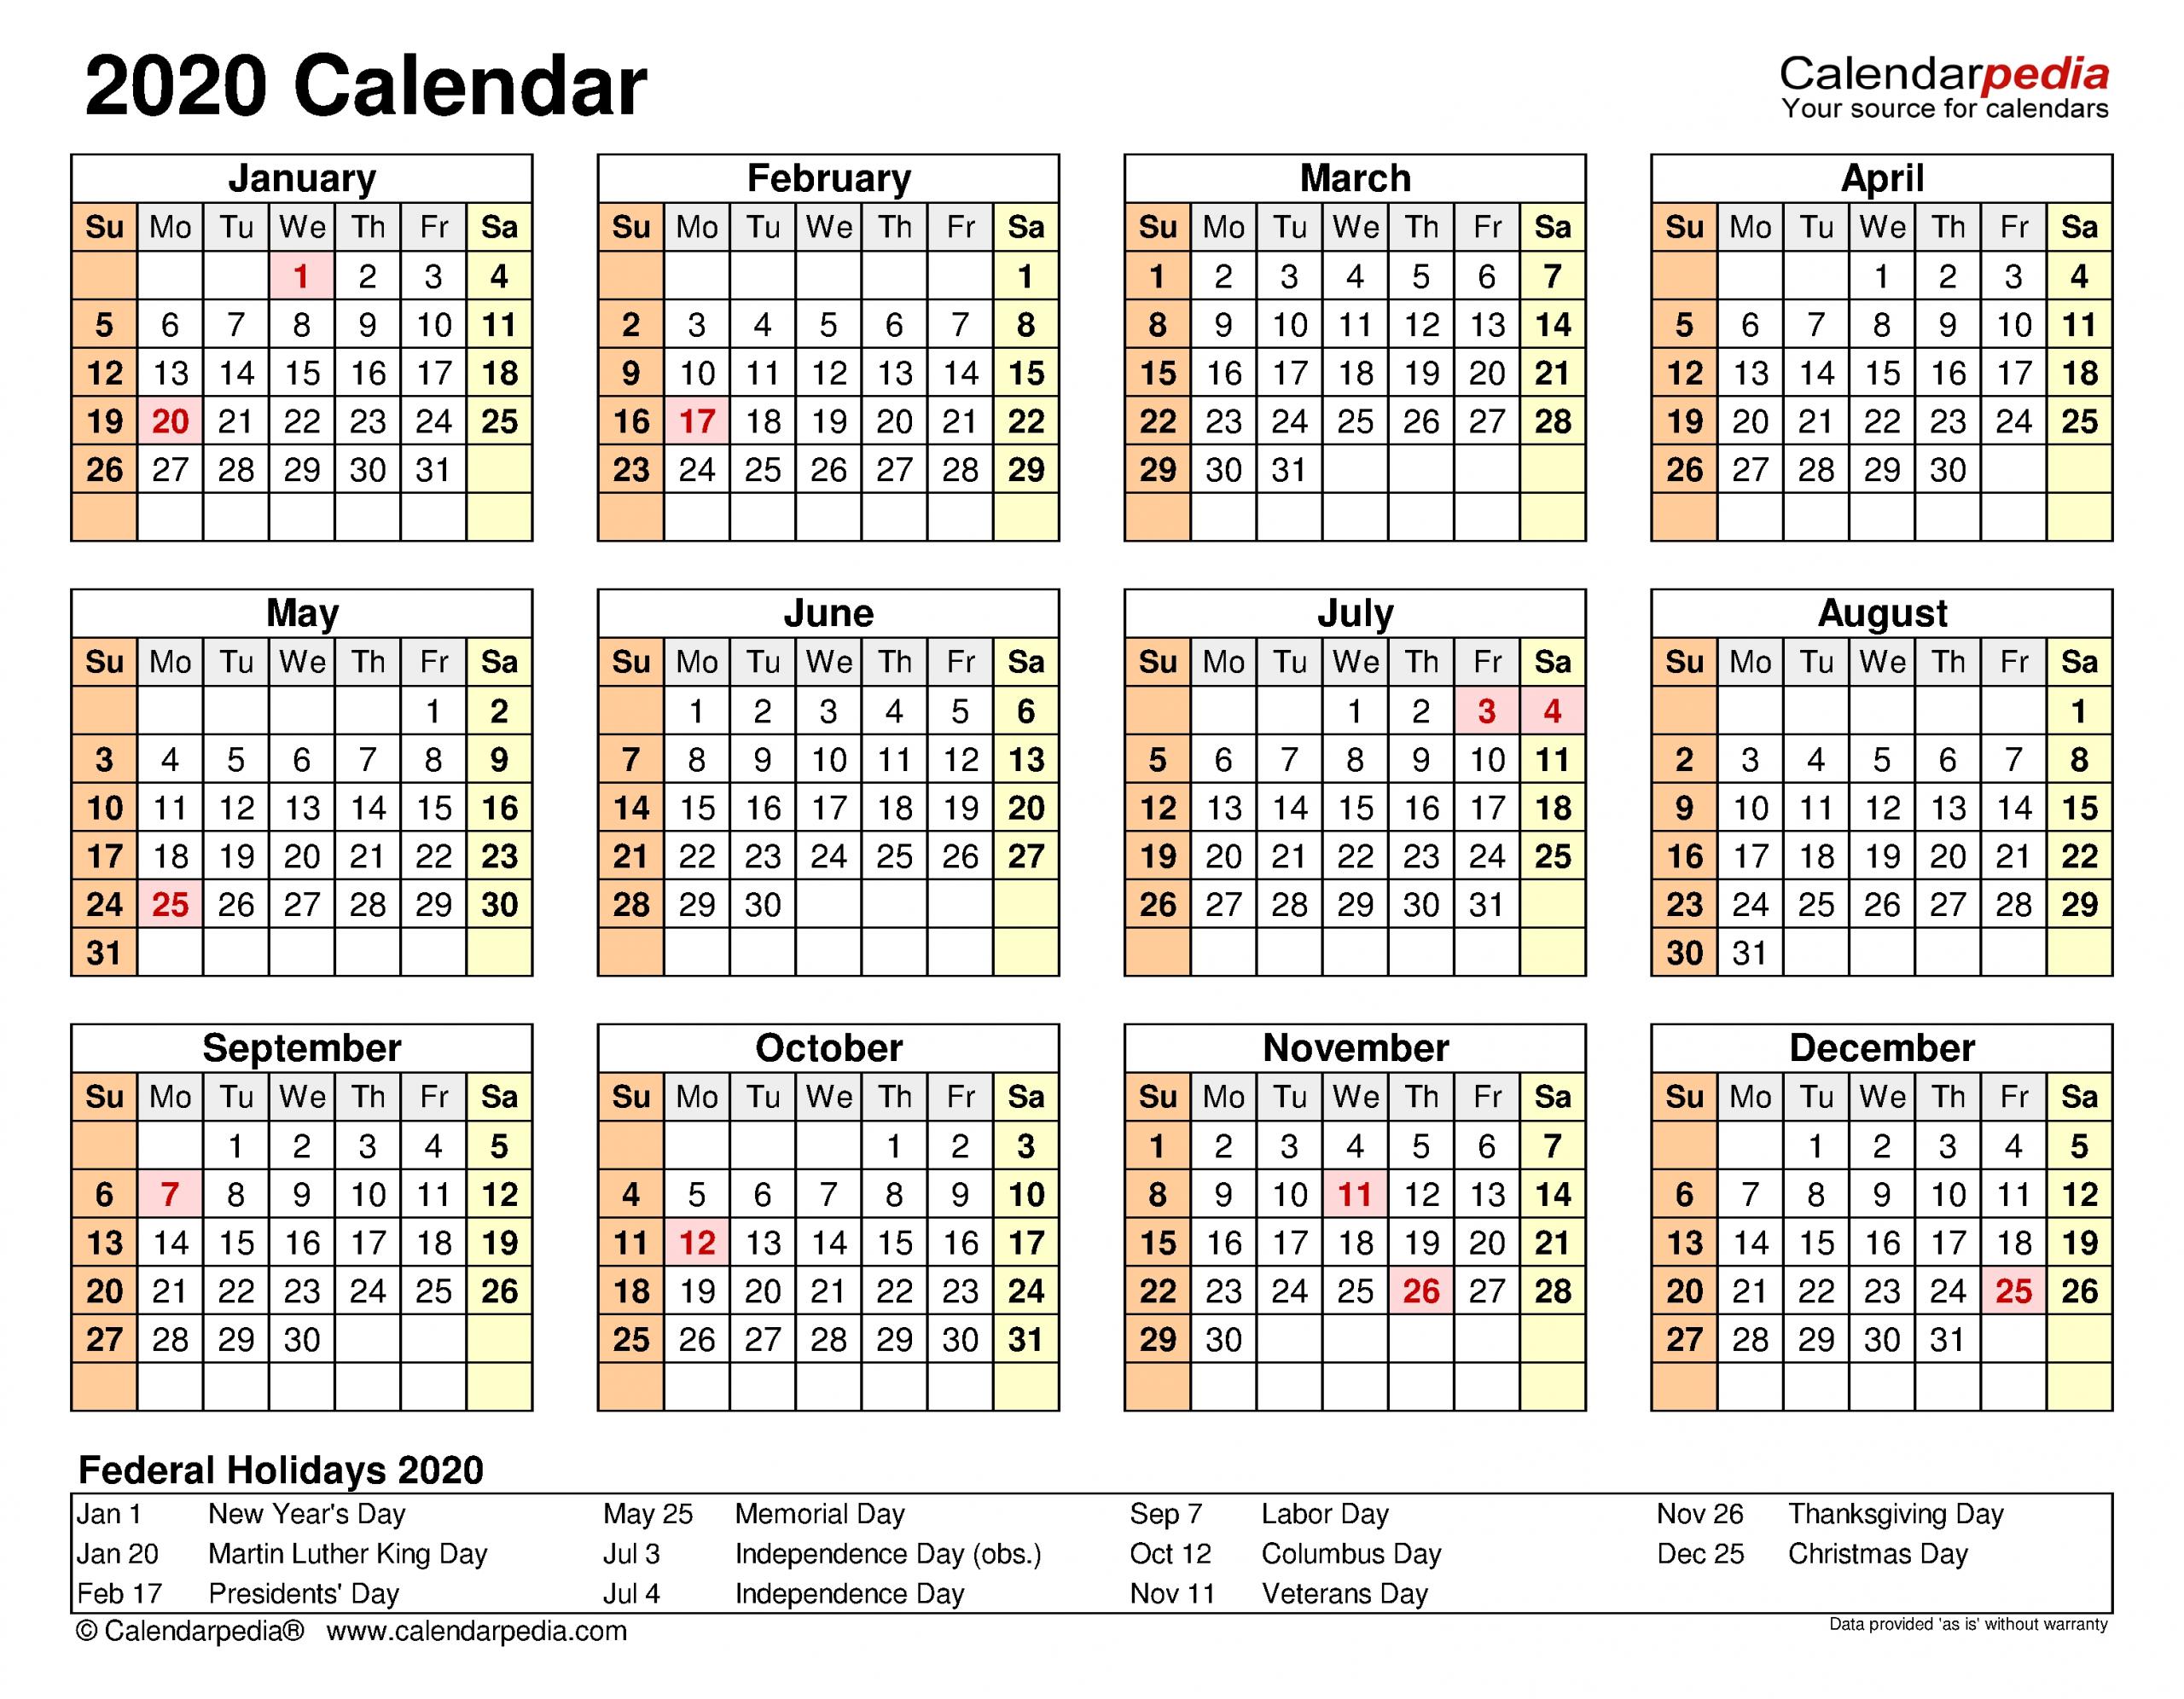 2020 Calendar Free Printable Excel Templates Calendarpedia